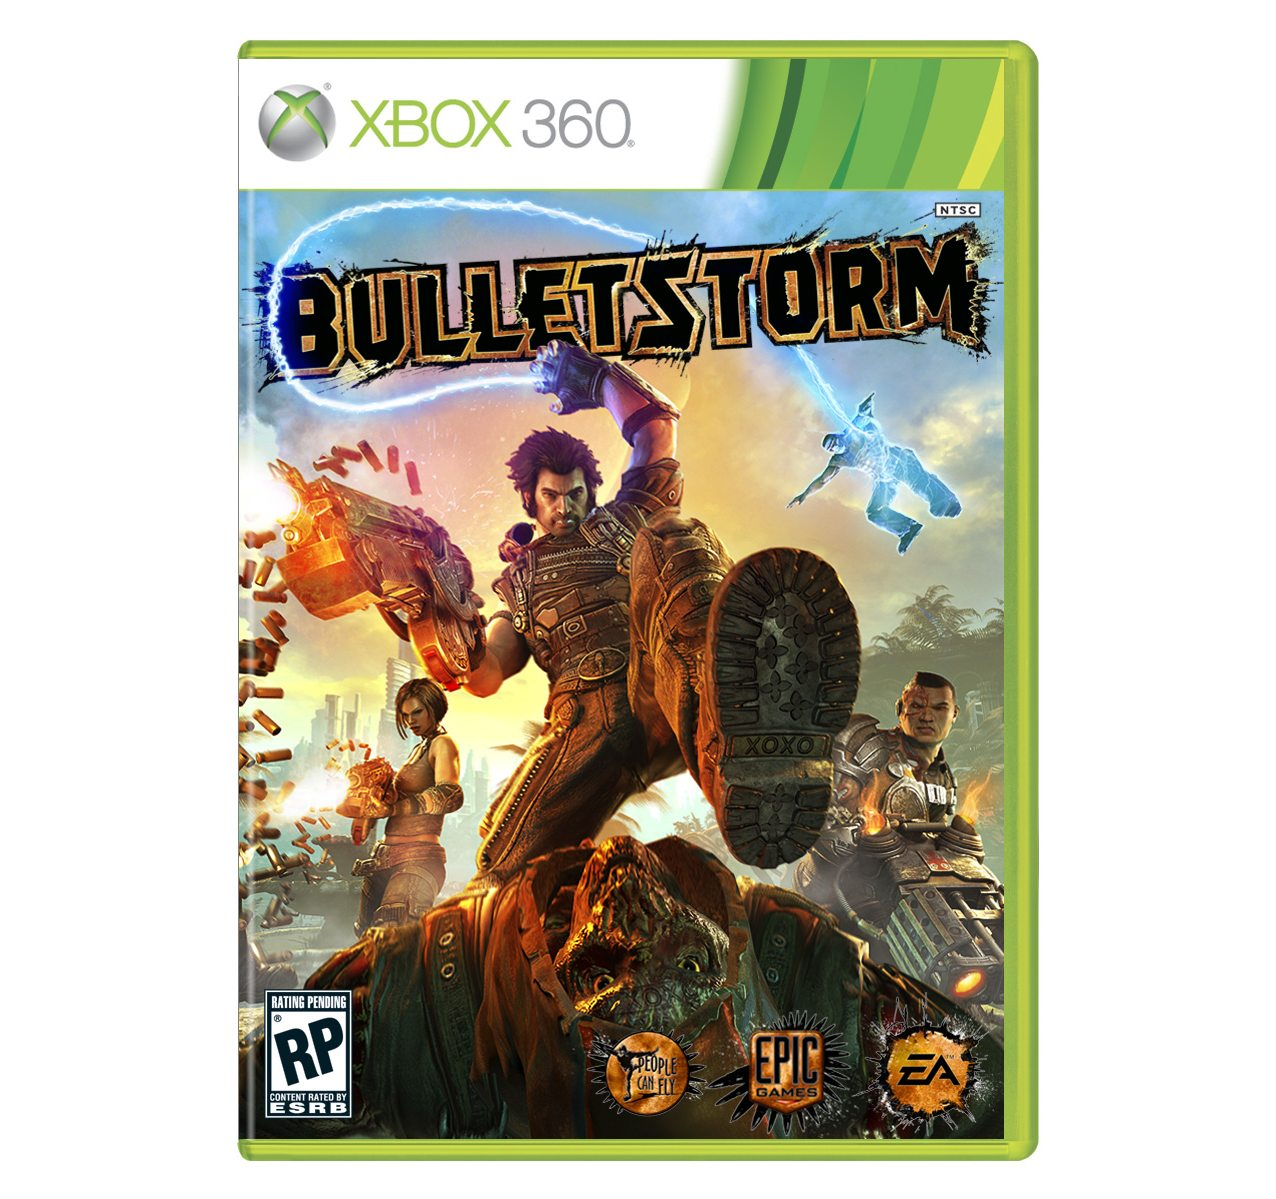 Xbox 360 Bulletstorm Xbox 360